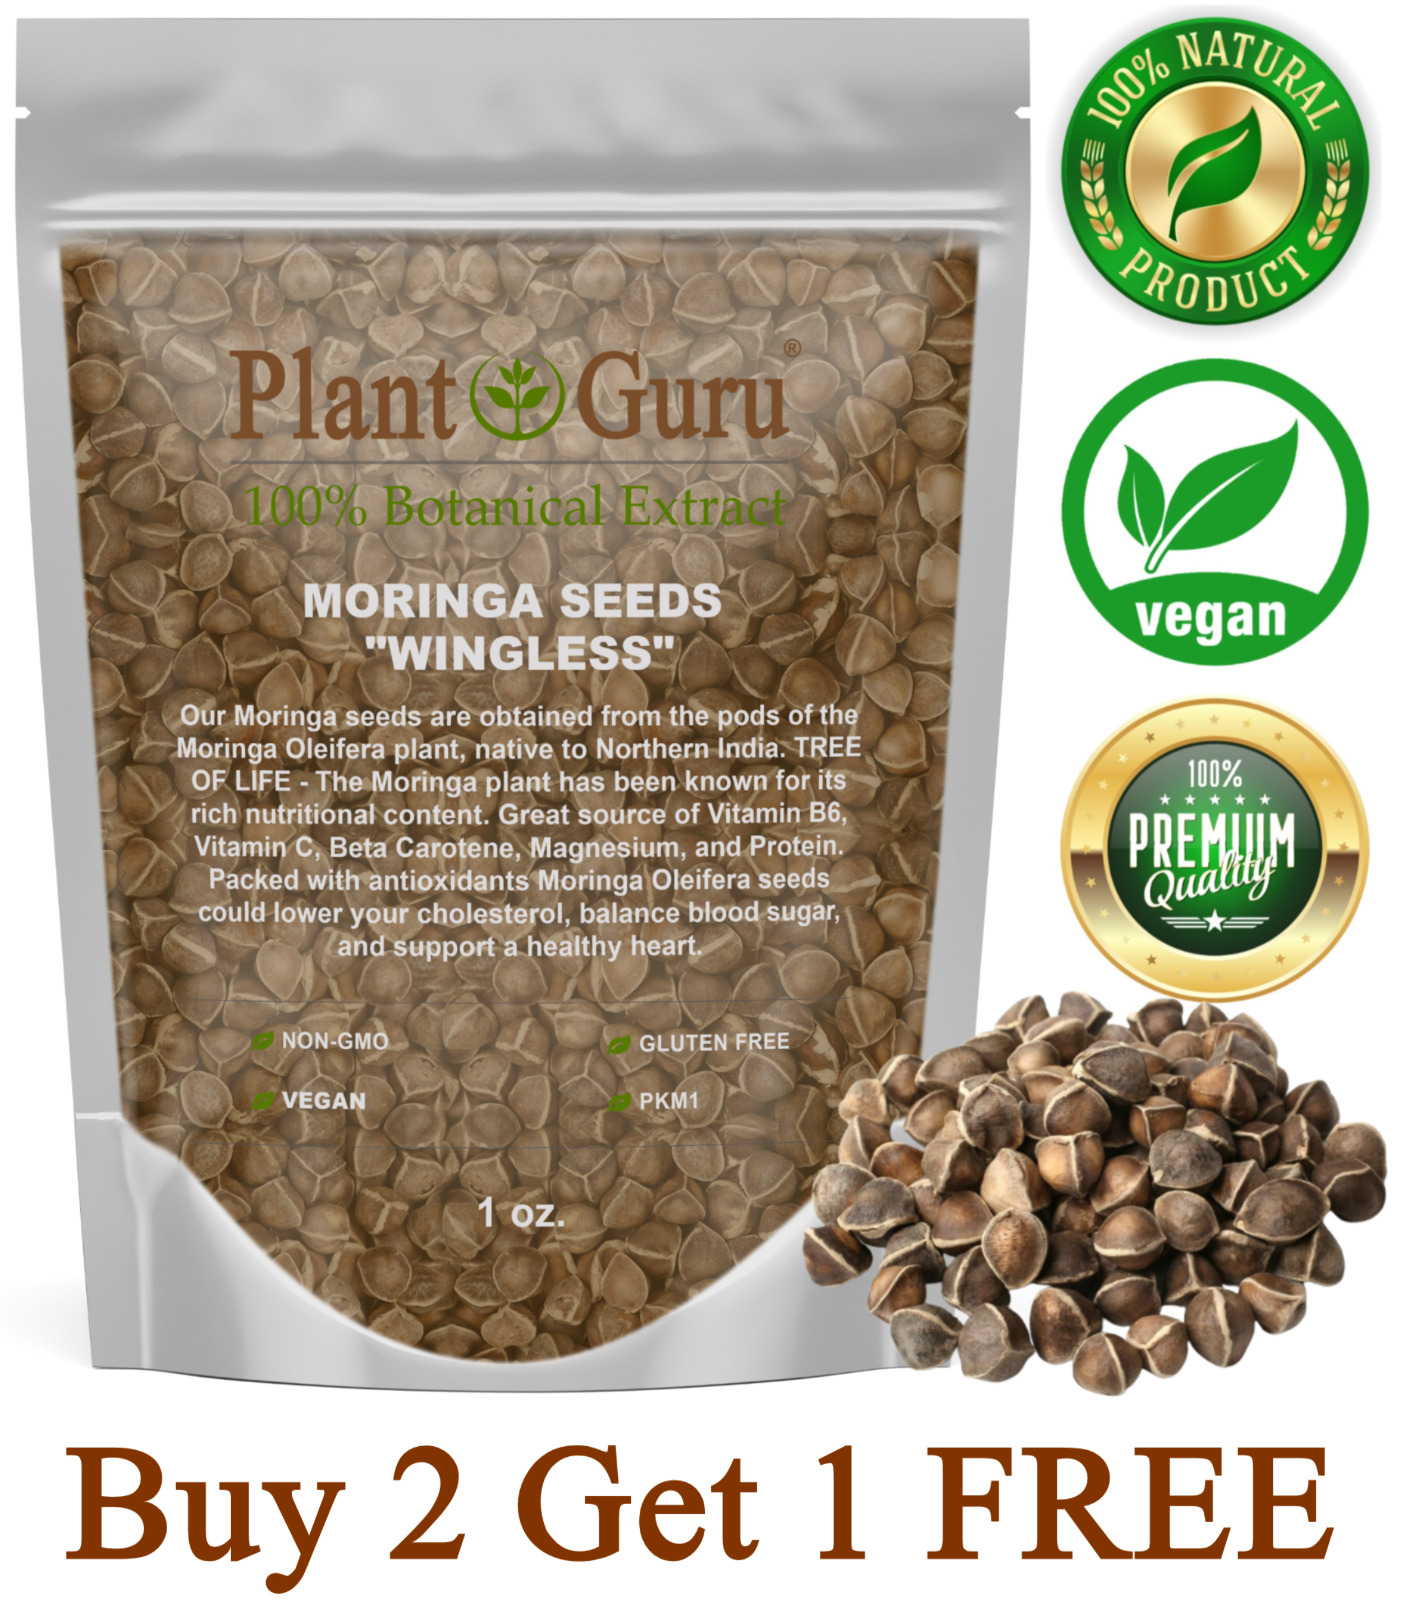 100 Moringa Oleifera Seeds 1 oz. WINGLESS Fresh Organic Semillas de Moringa Tree